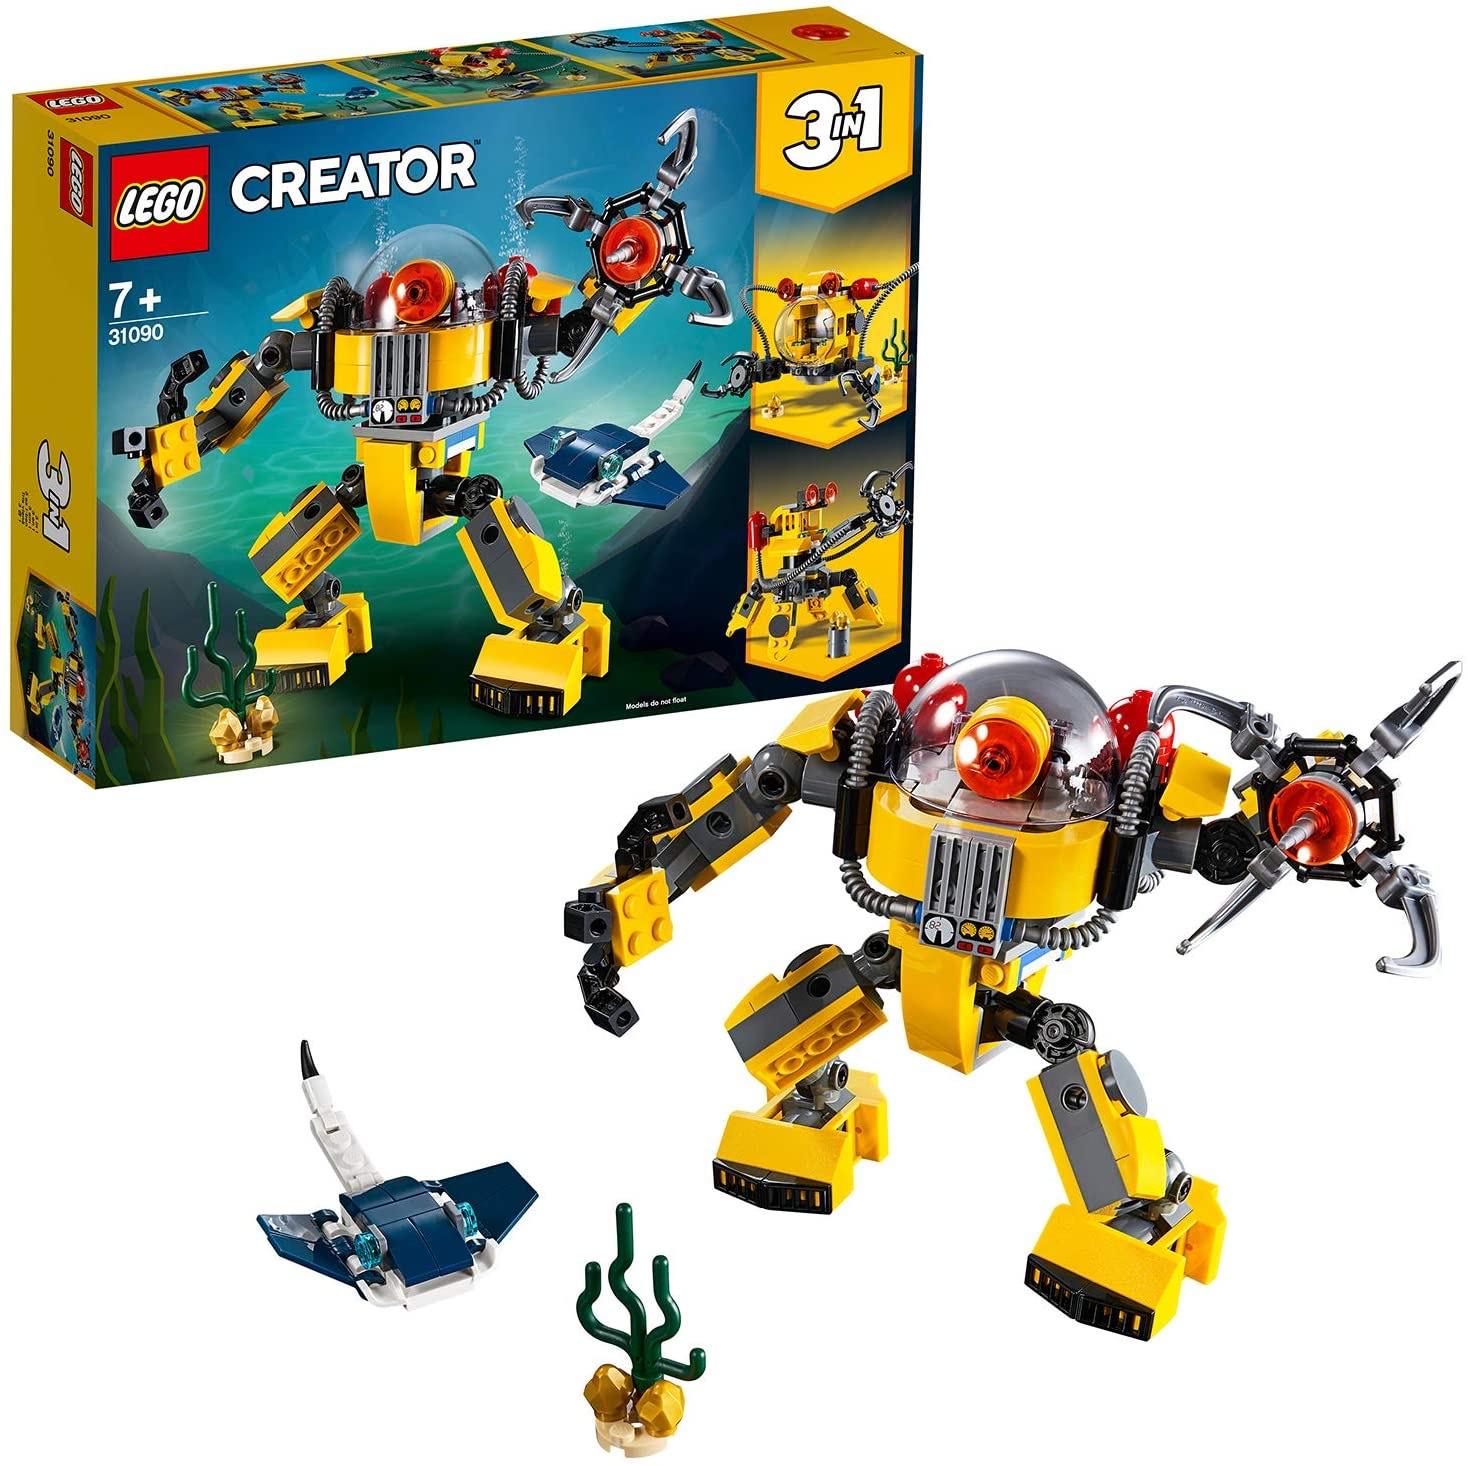 LEGO 31090 Underwater Robot - £7.20 @ Sainsbury's (High Wycombe)